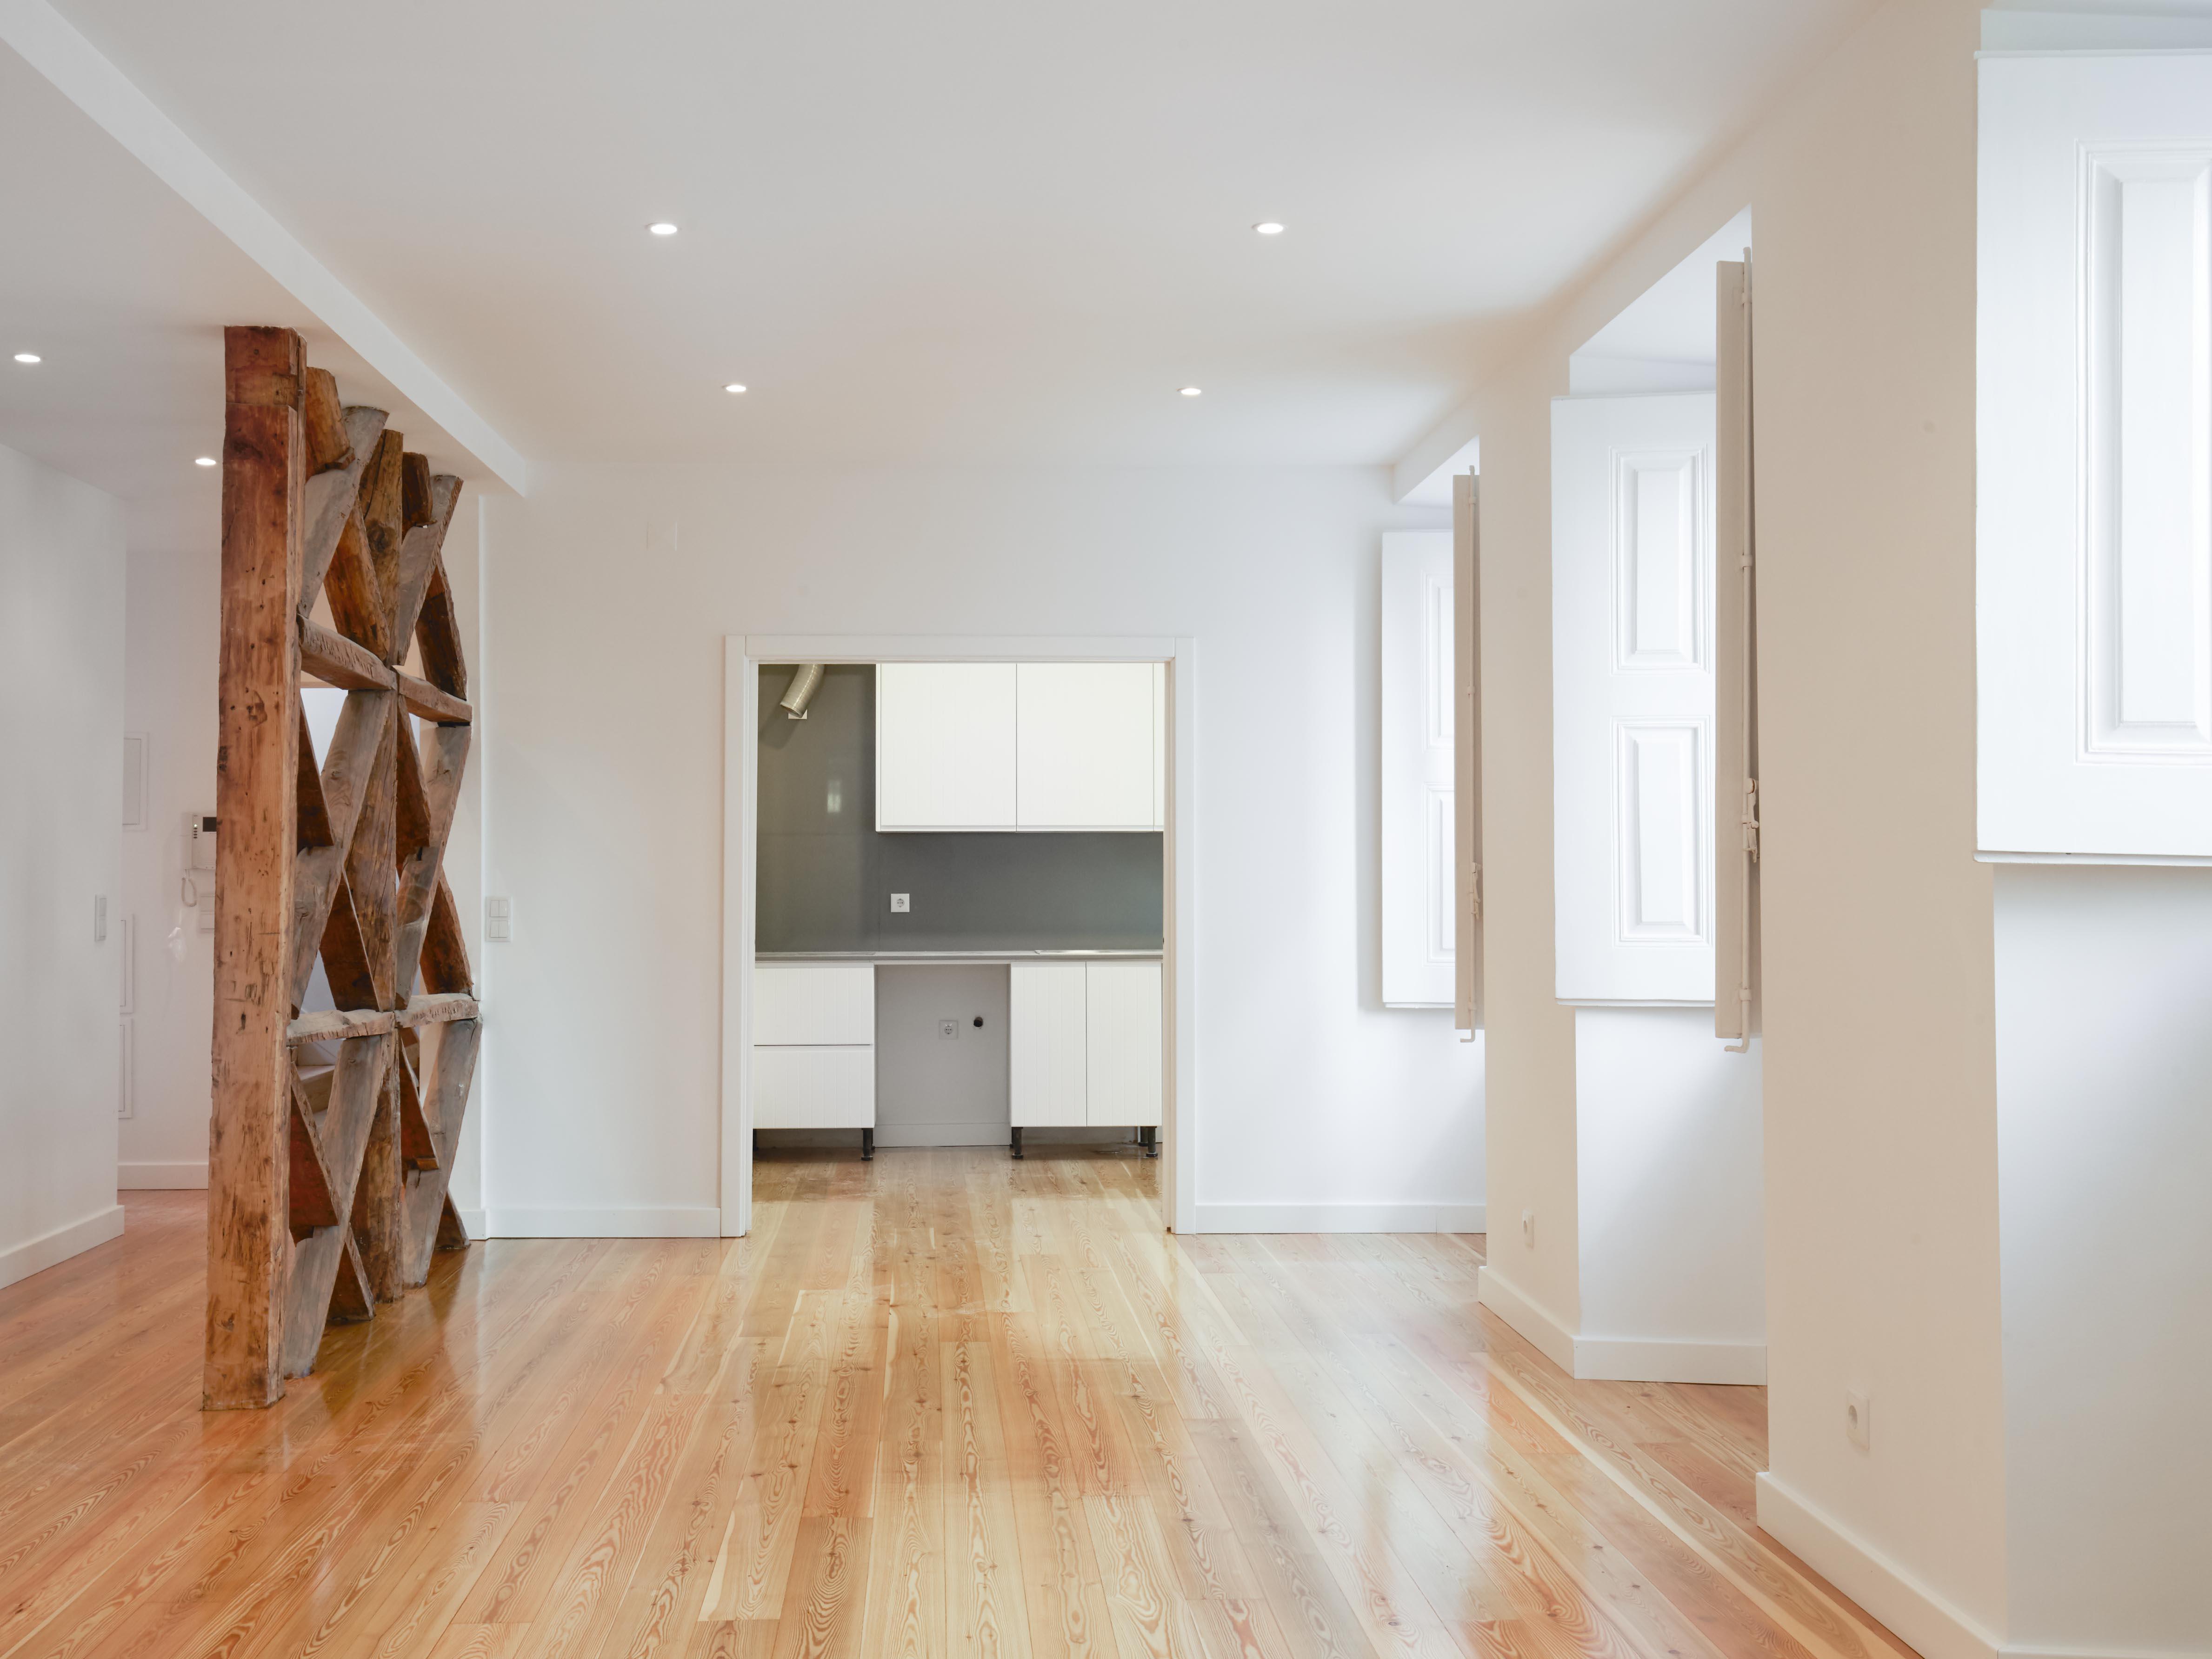 公寓 為 出售 在 Flat, 2 bedrooms, for Sale Lisboa, 葡京, 1200-362 葡萄牙